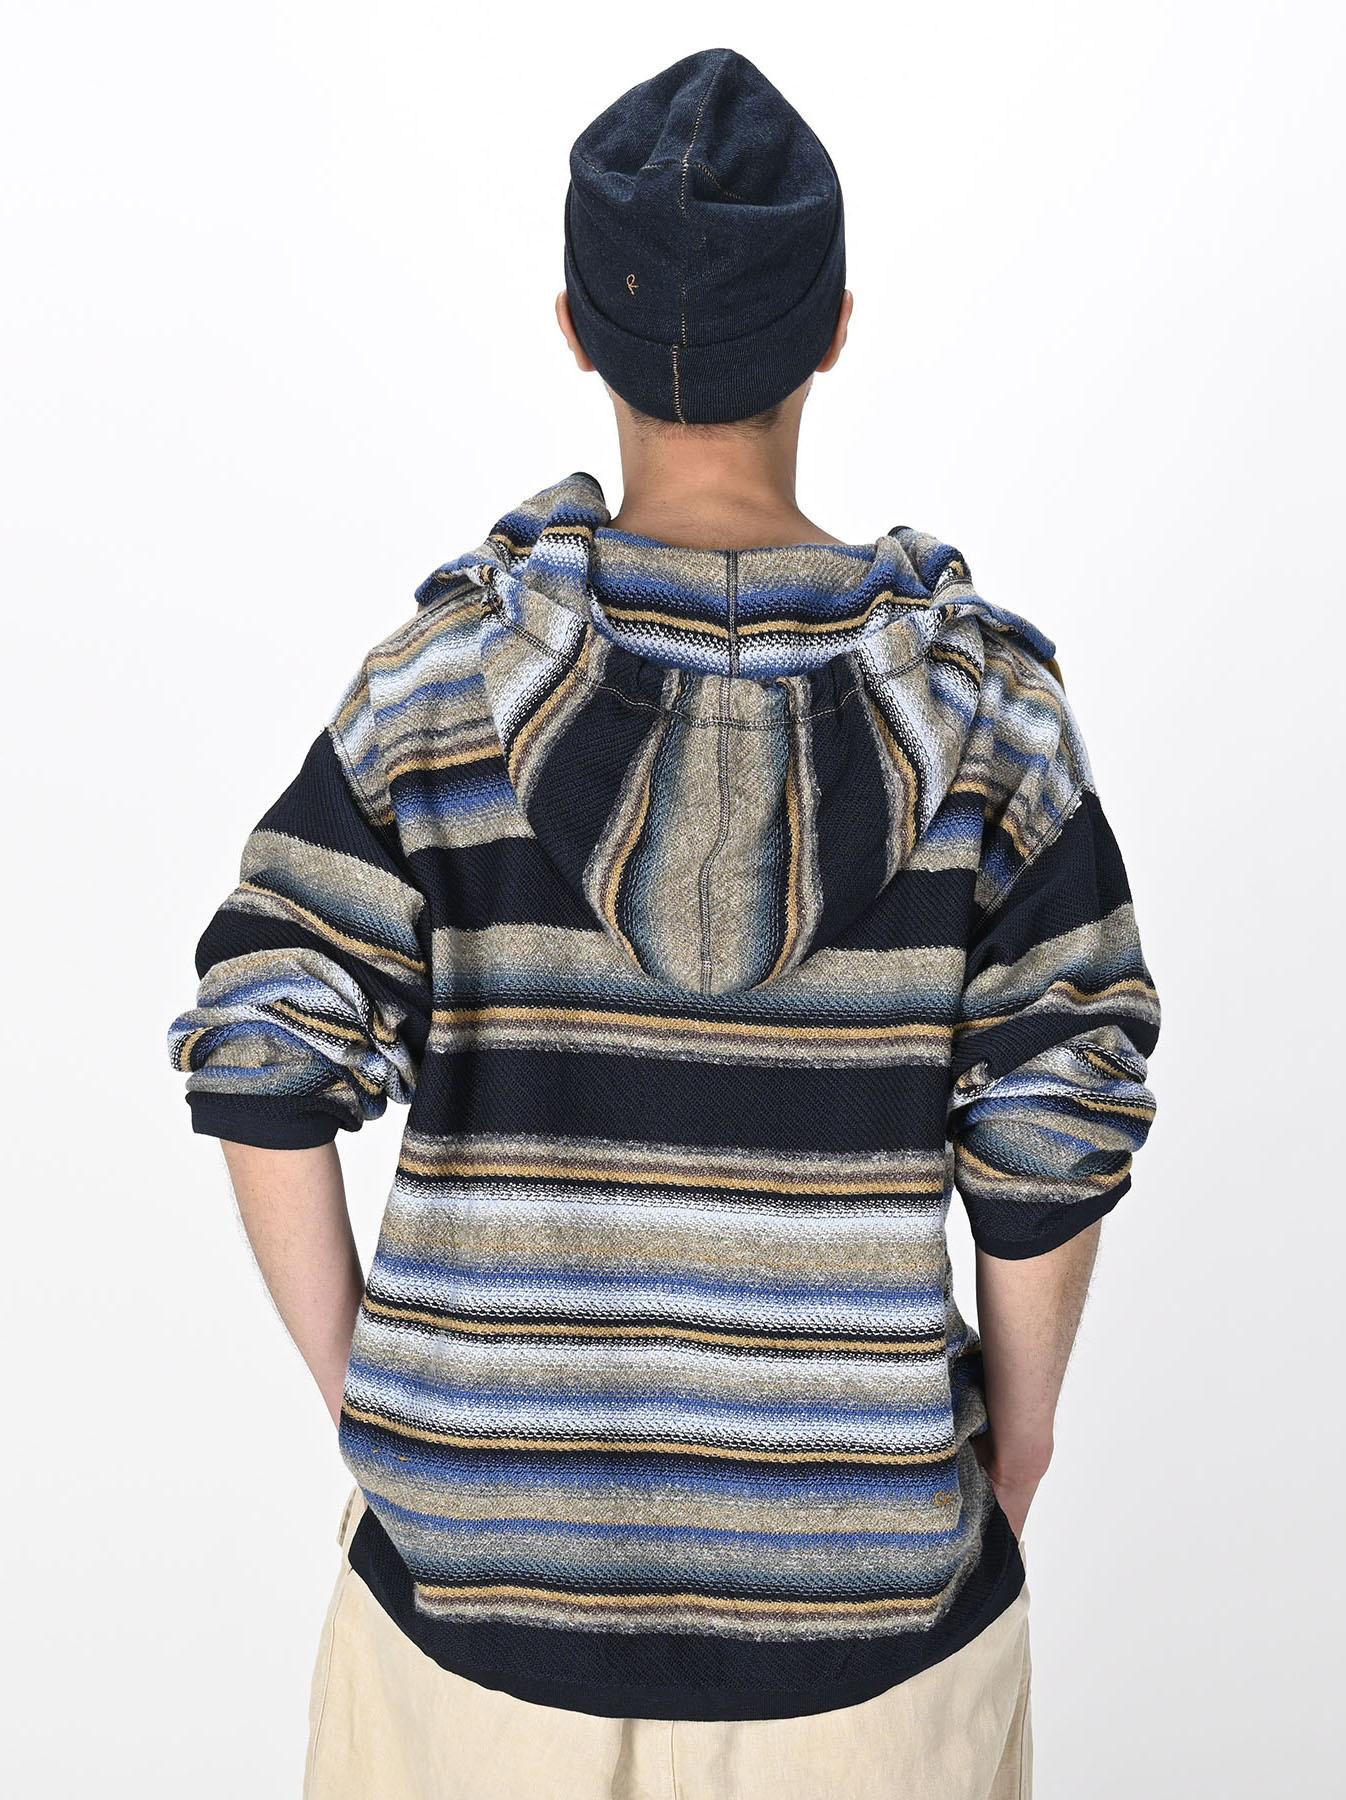 Indigo Rainbow Stripe Knit-sew 908 Umahiko Hoodie (0721)-4